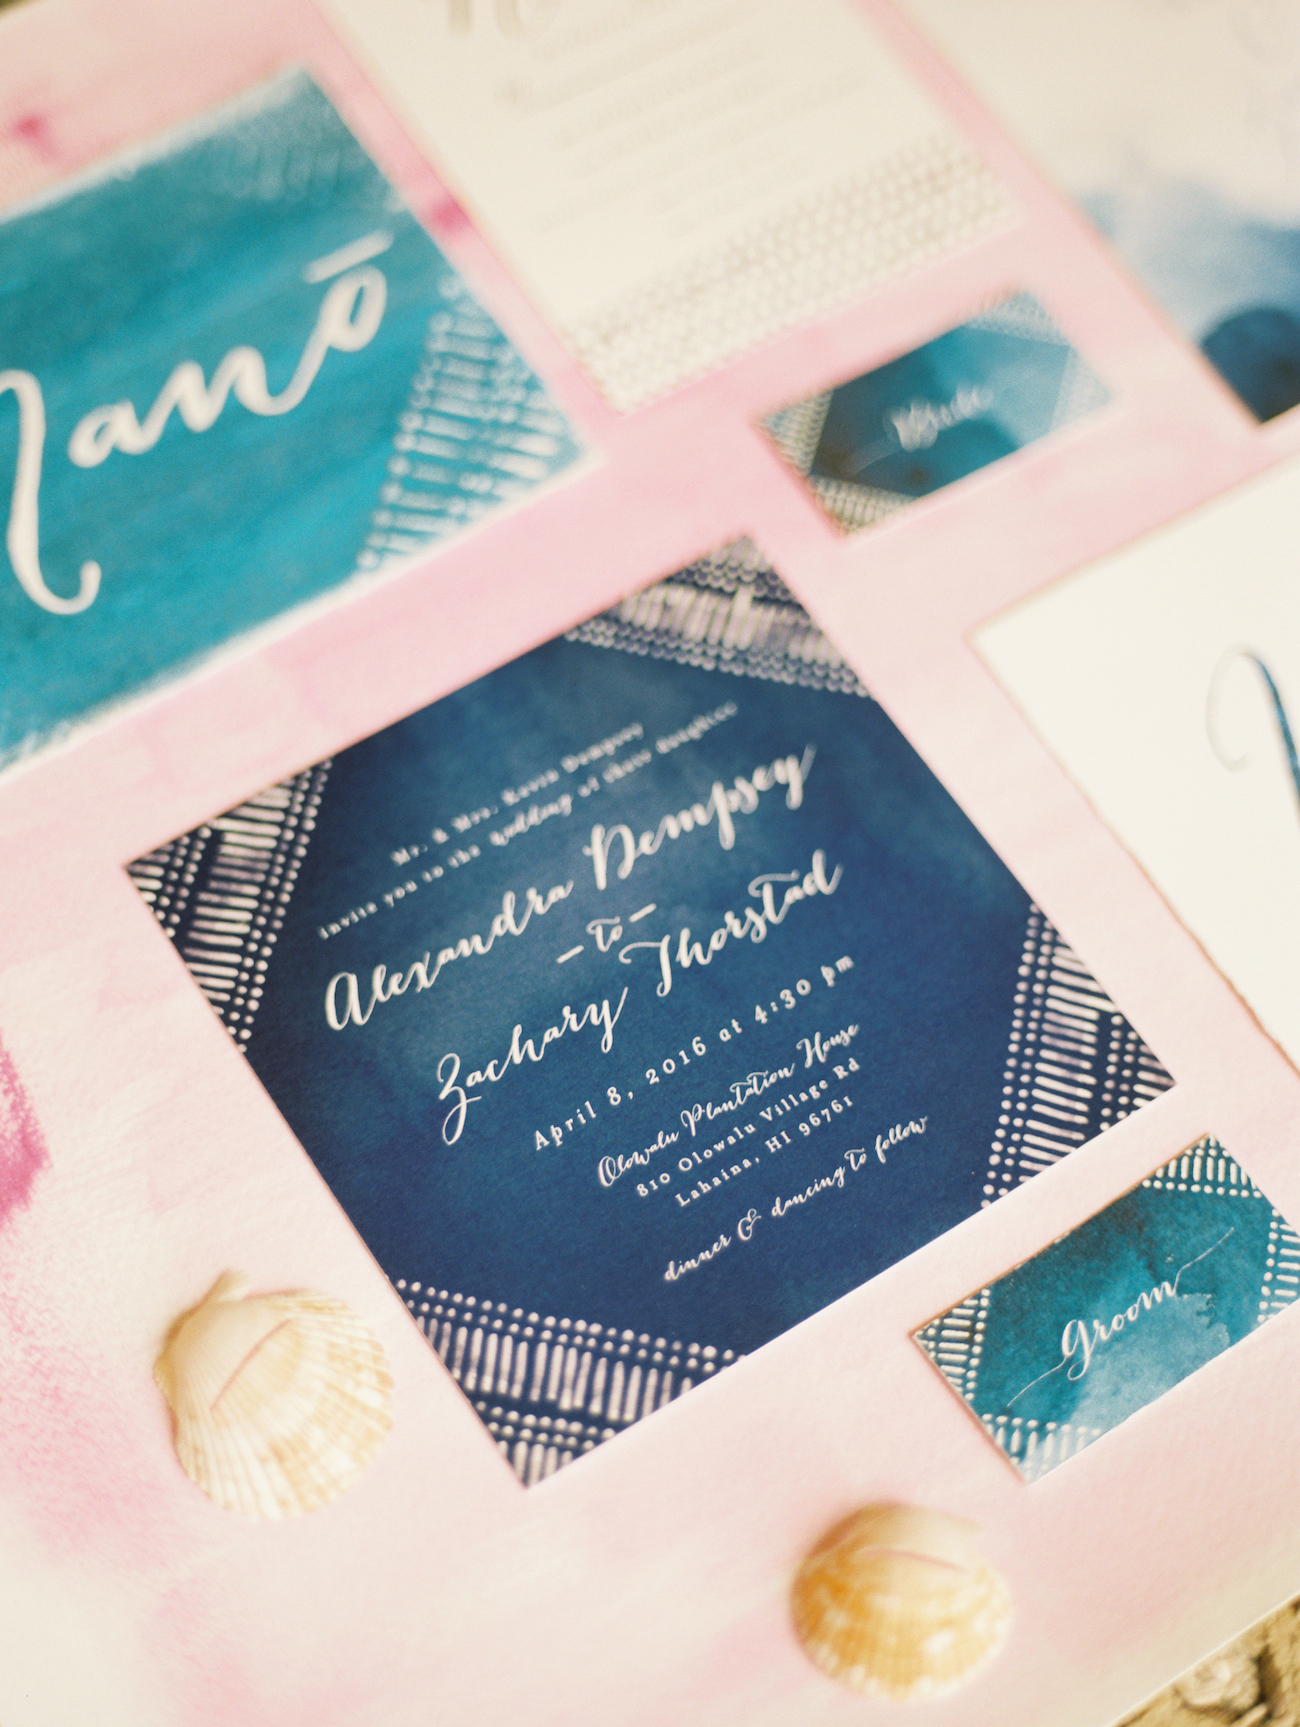 maui hawaii wedding by wendy laurel and unveiled hawaii-3.jpg